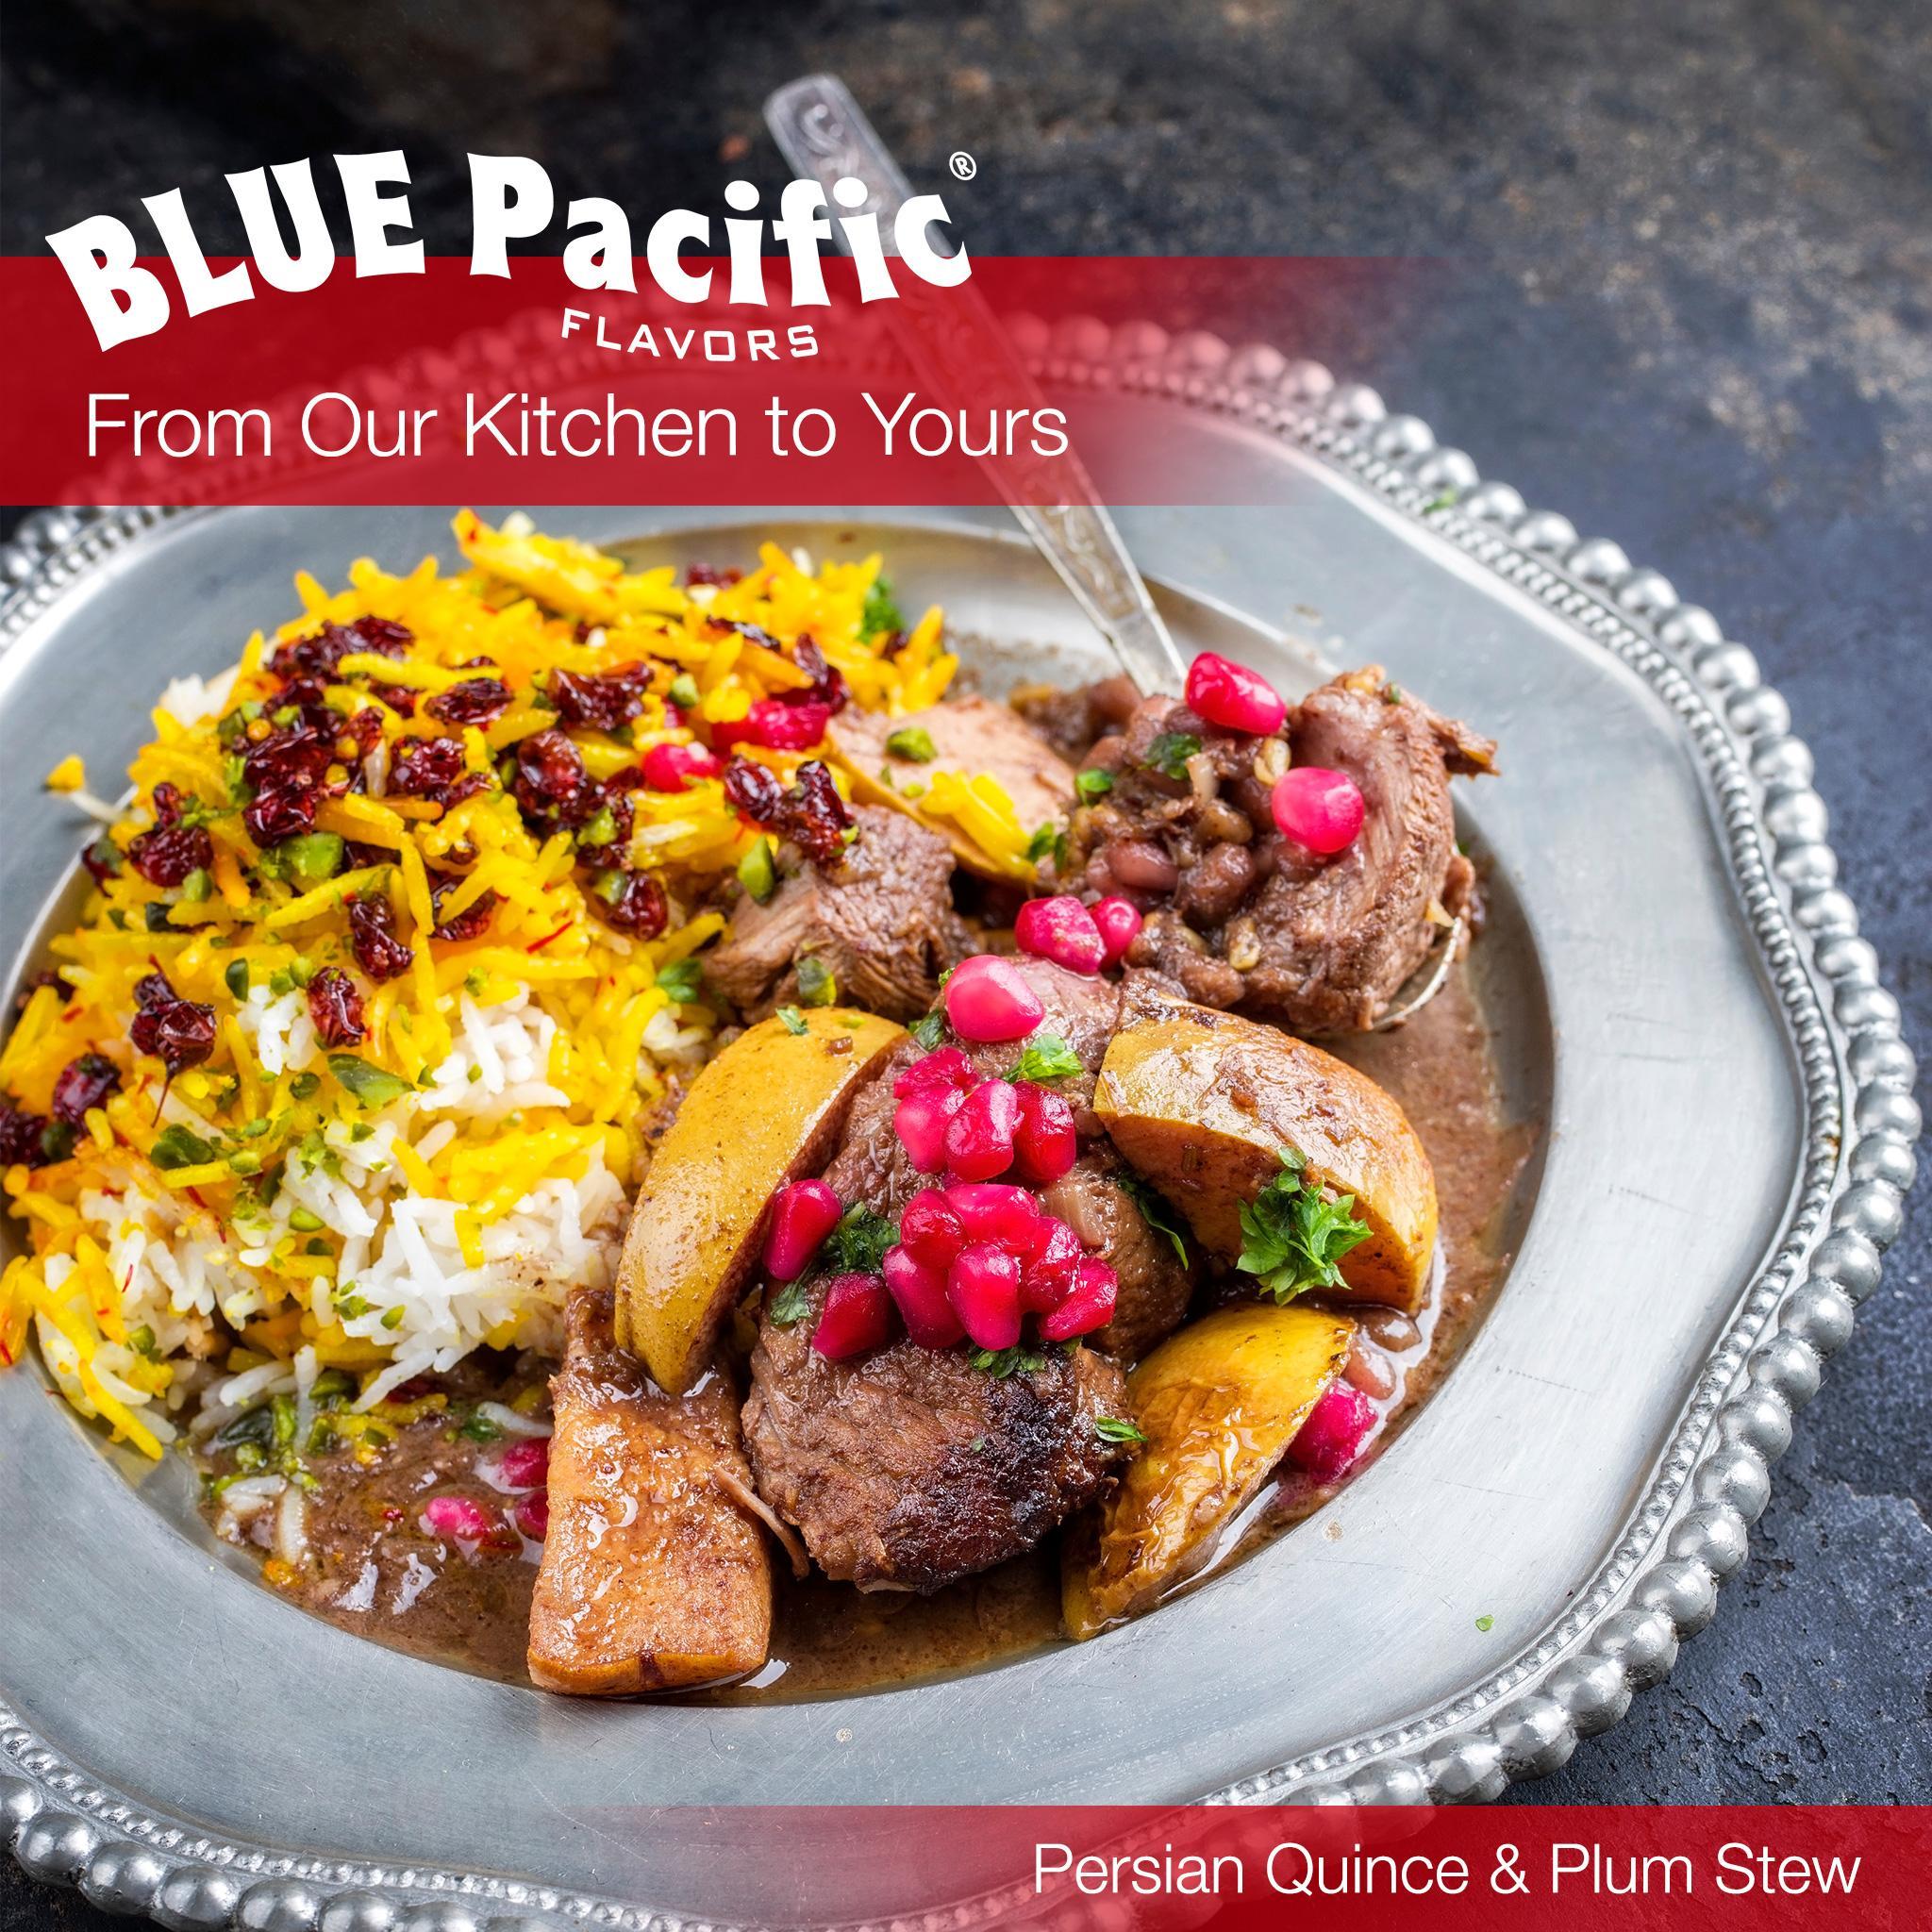 Persian Quince Plumb Stew